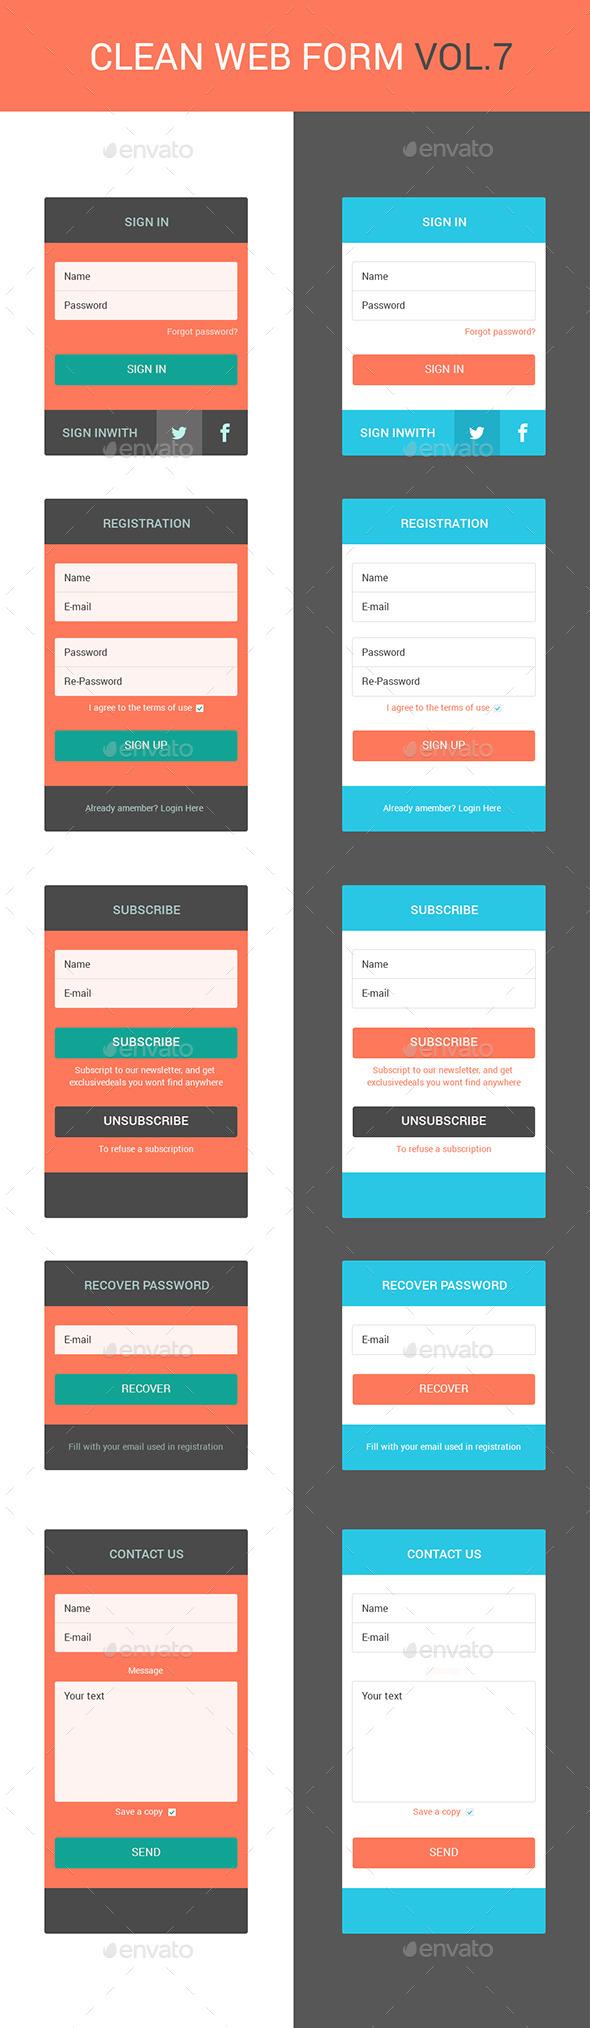 Clean web forms vol.7